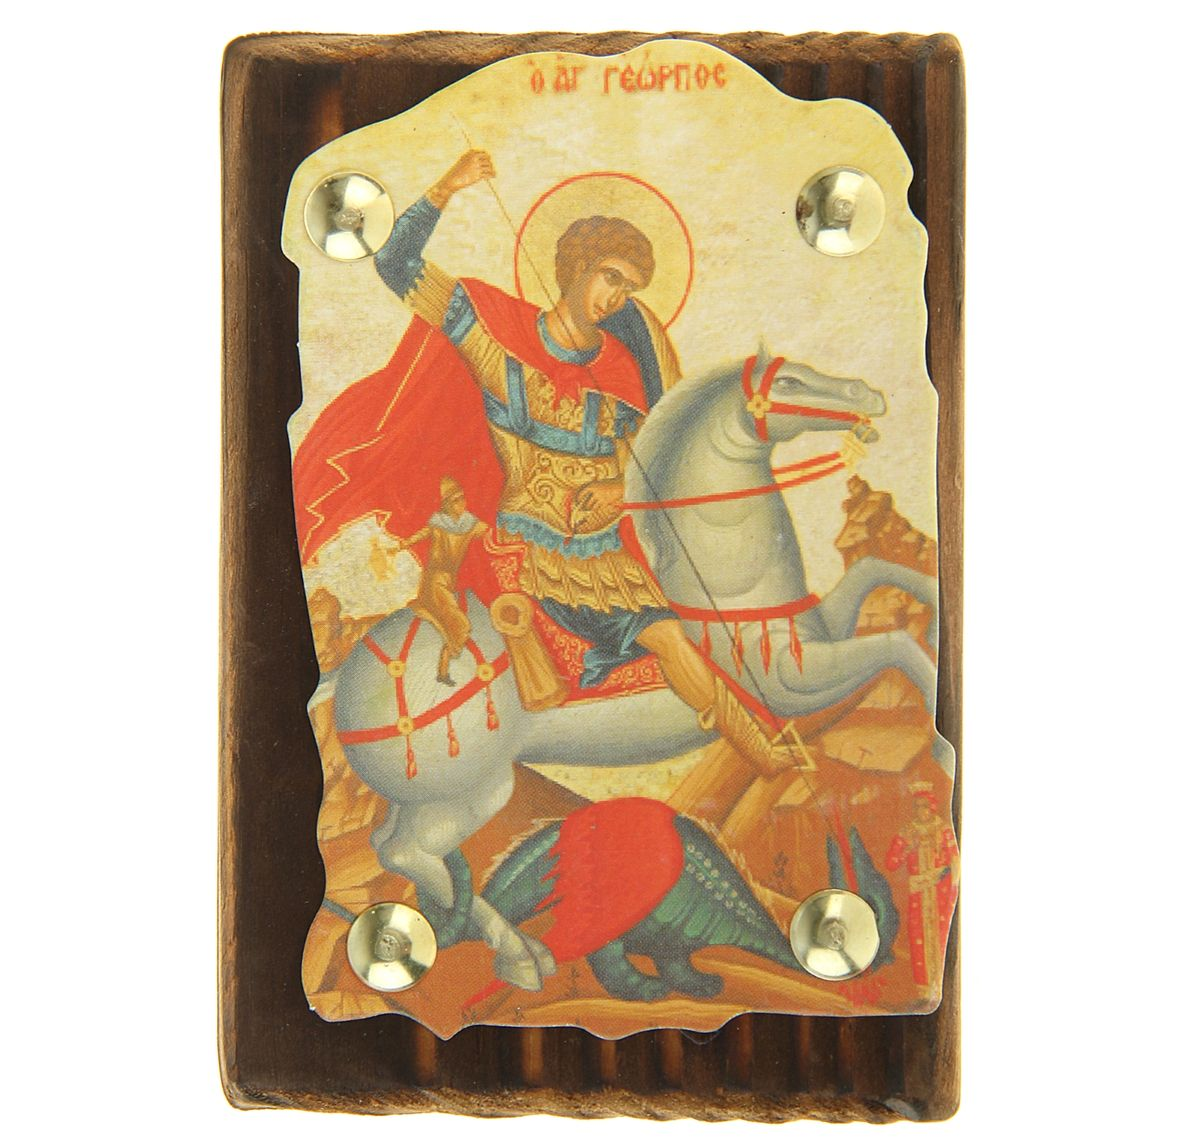 Икона Георгий Победоносец, 7,5 см х 11 см икона янтарная богородица скоропослушница кян 2 305